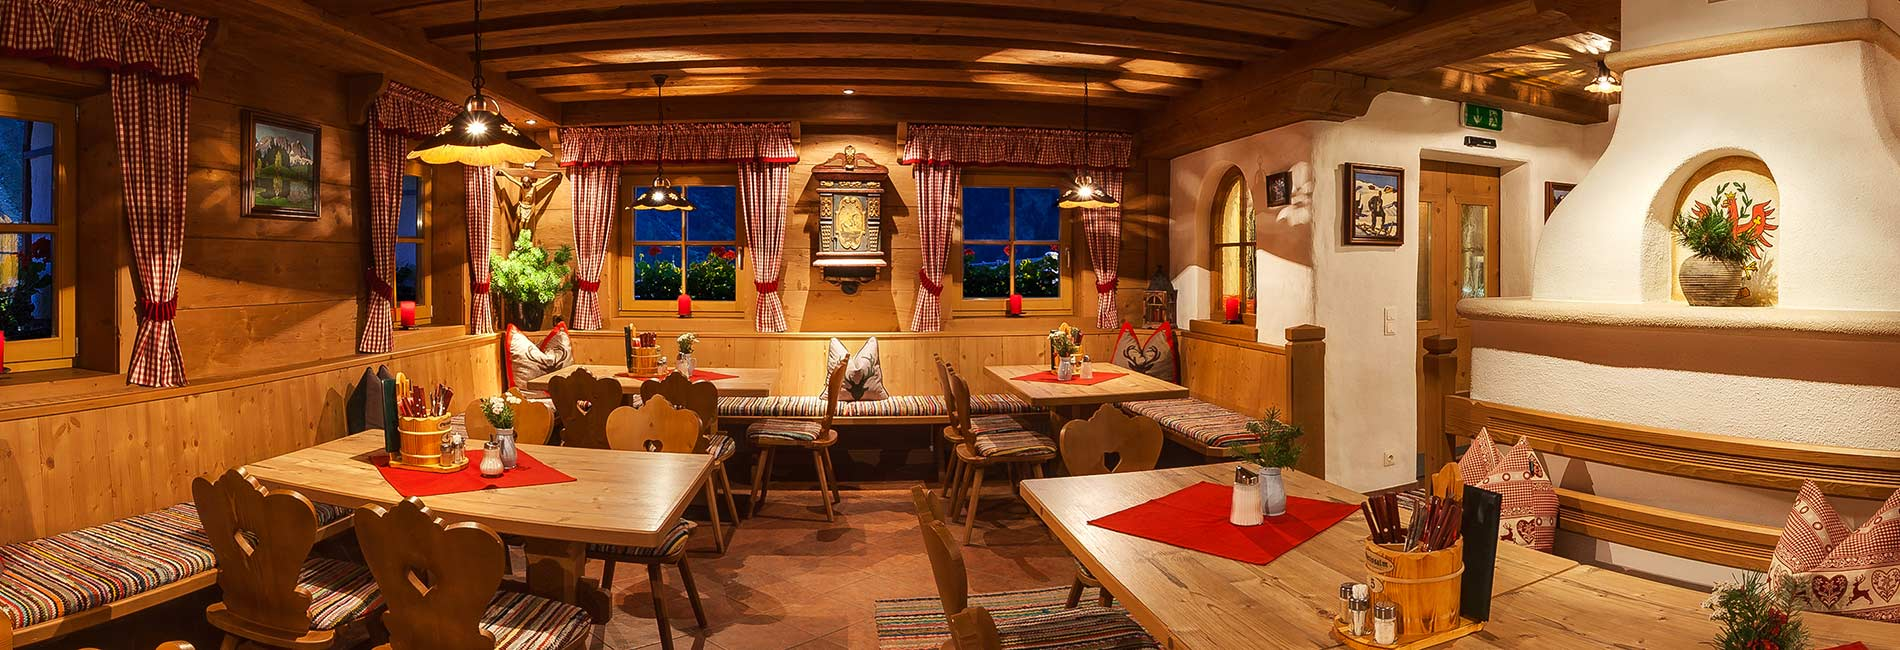 Oberiss Alm Ausflugsziel Hotel Neustift Milders Stubaital Tirol